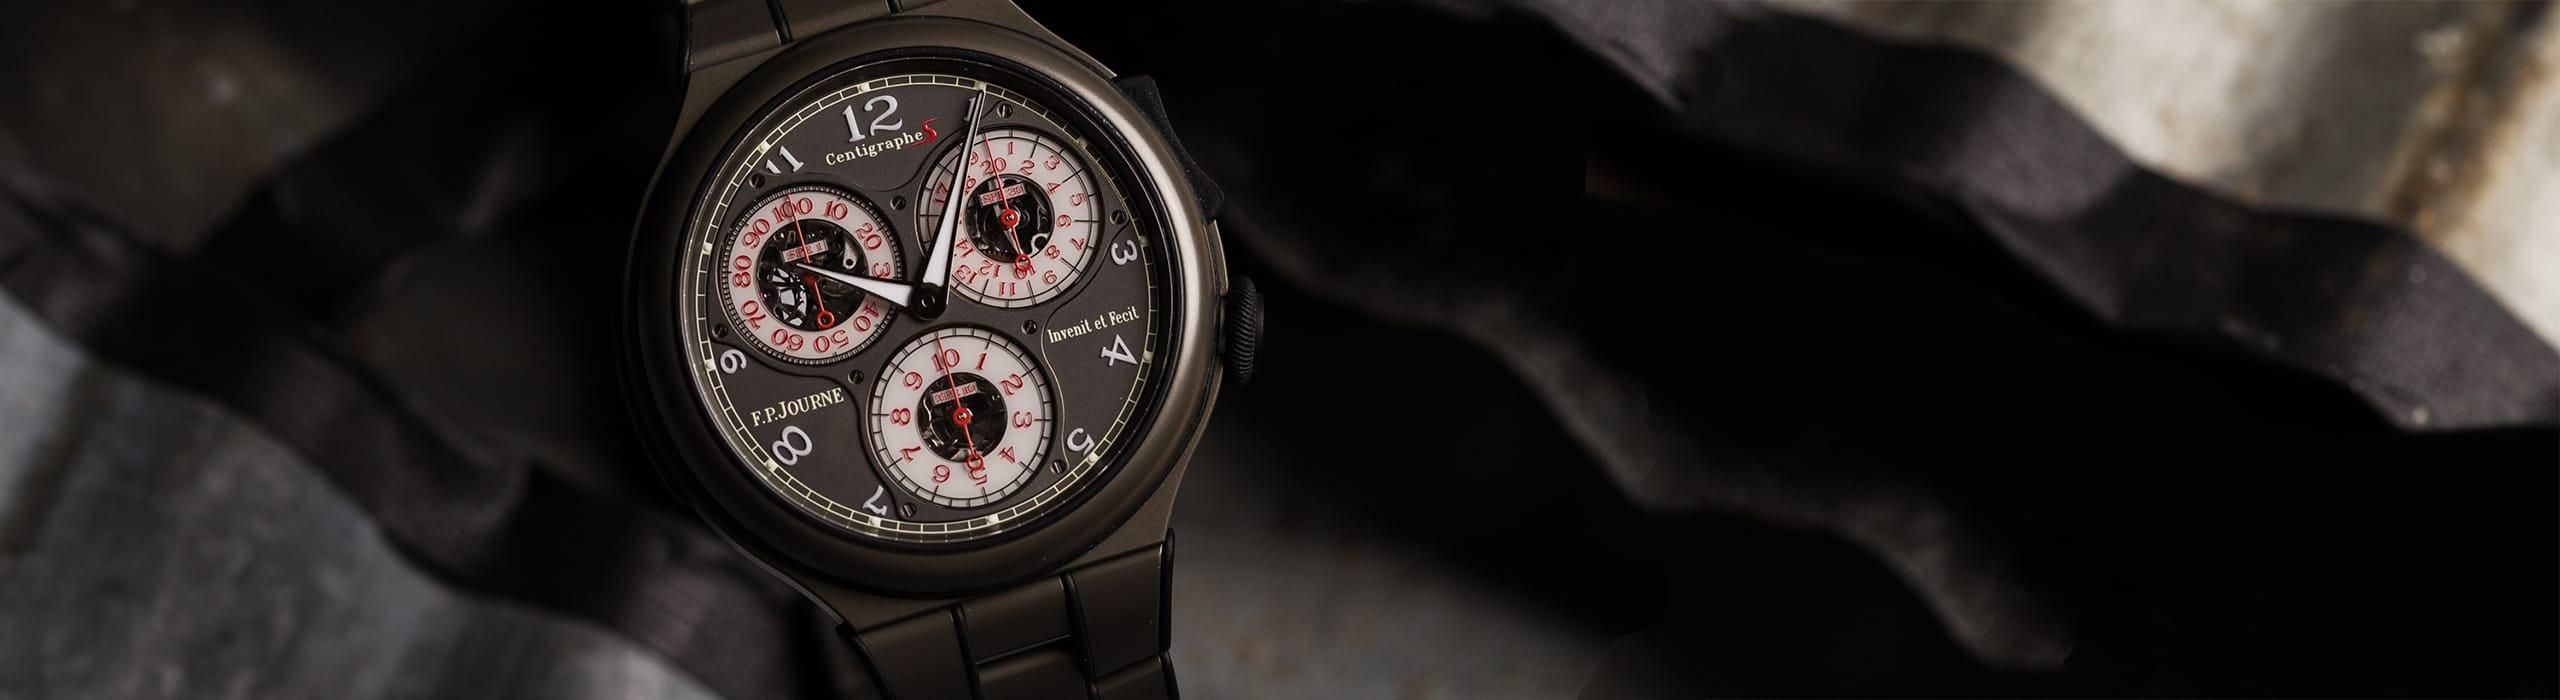 Favorite Titanium Watch Models